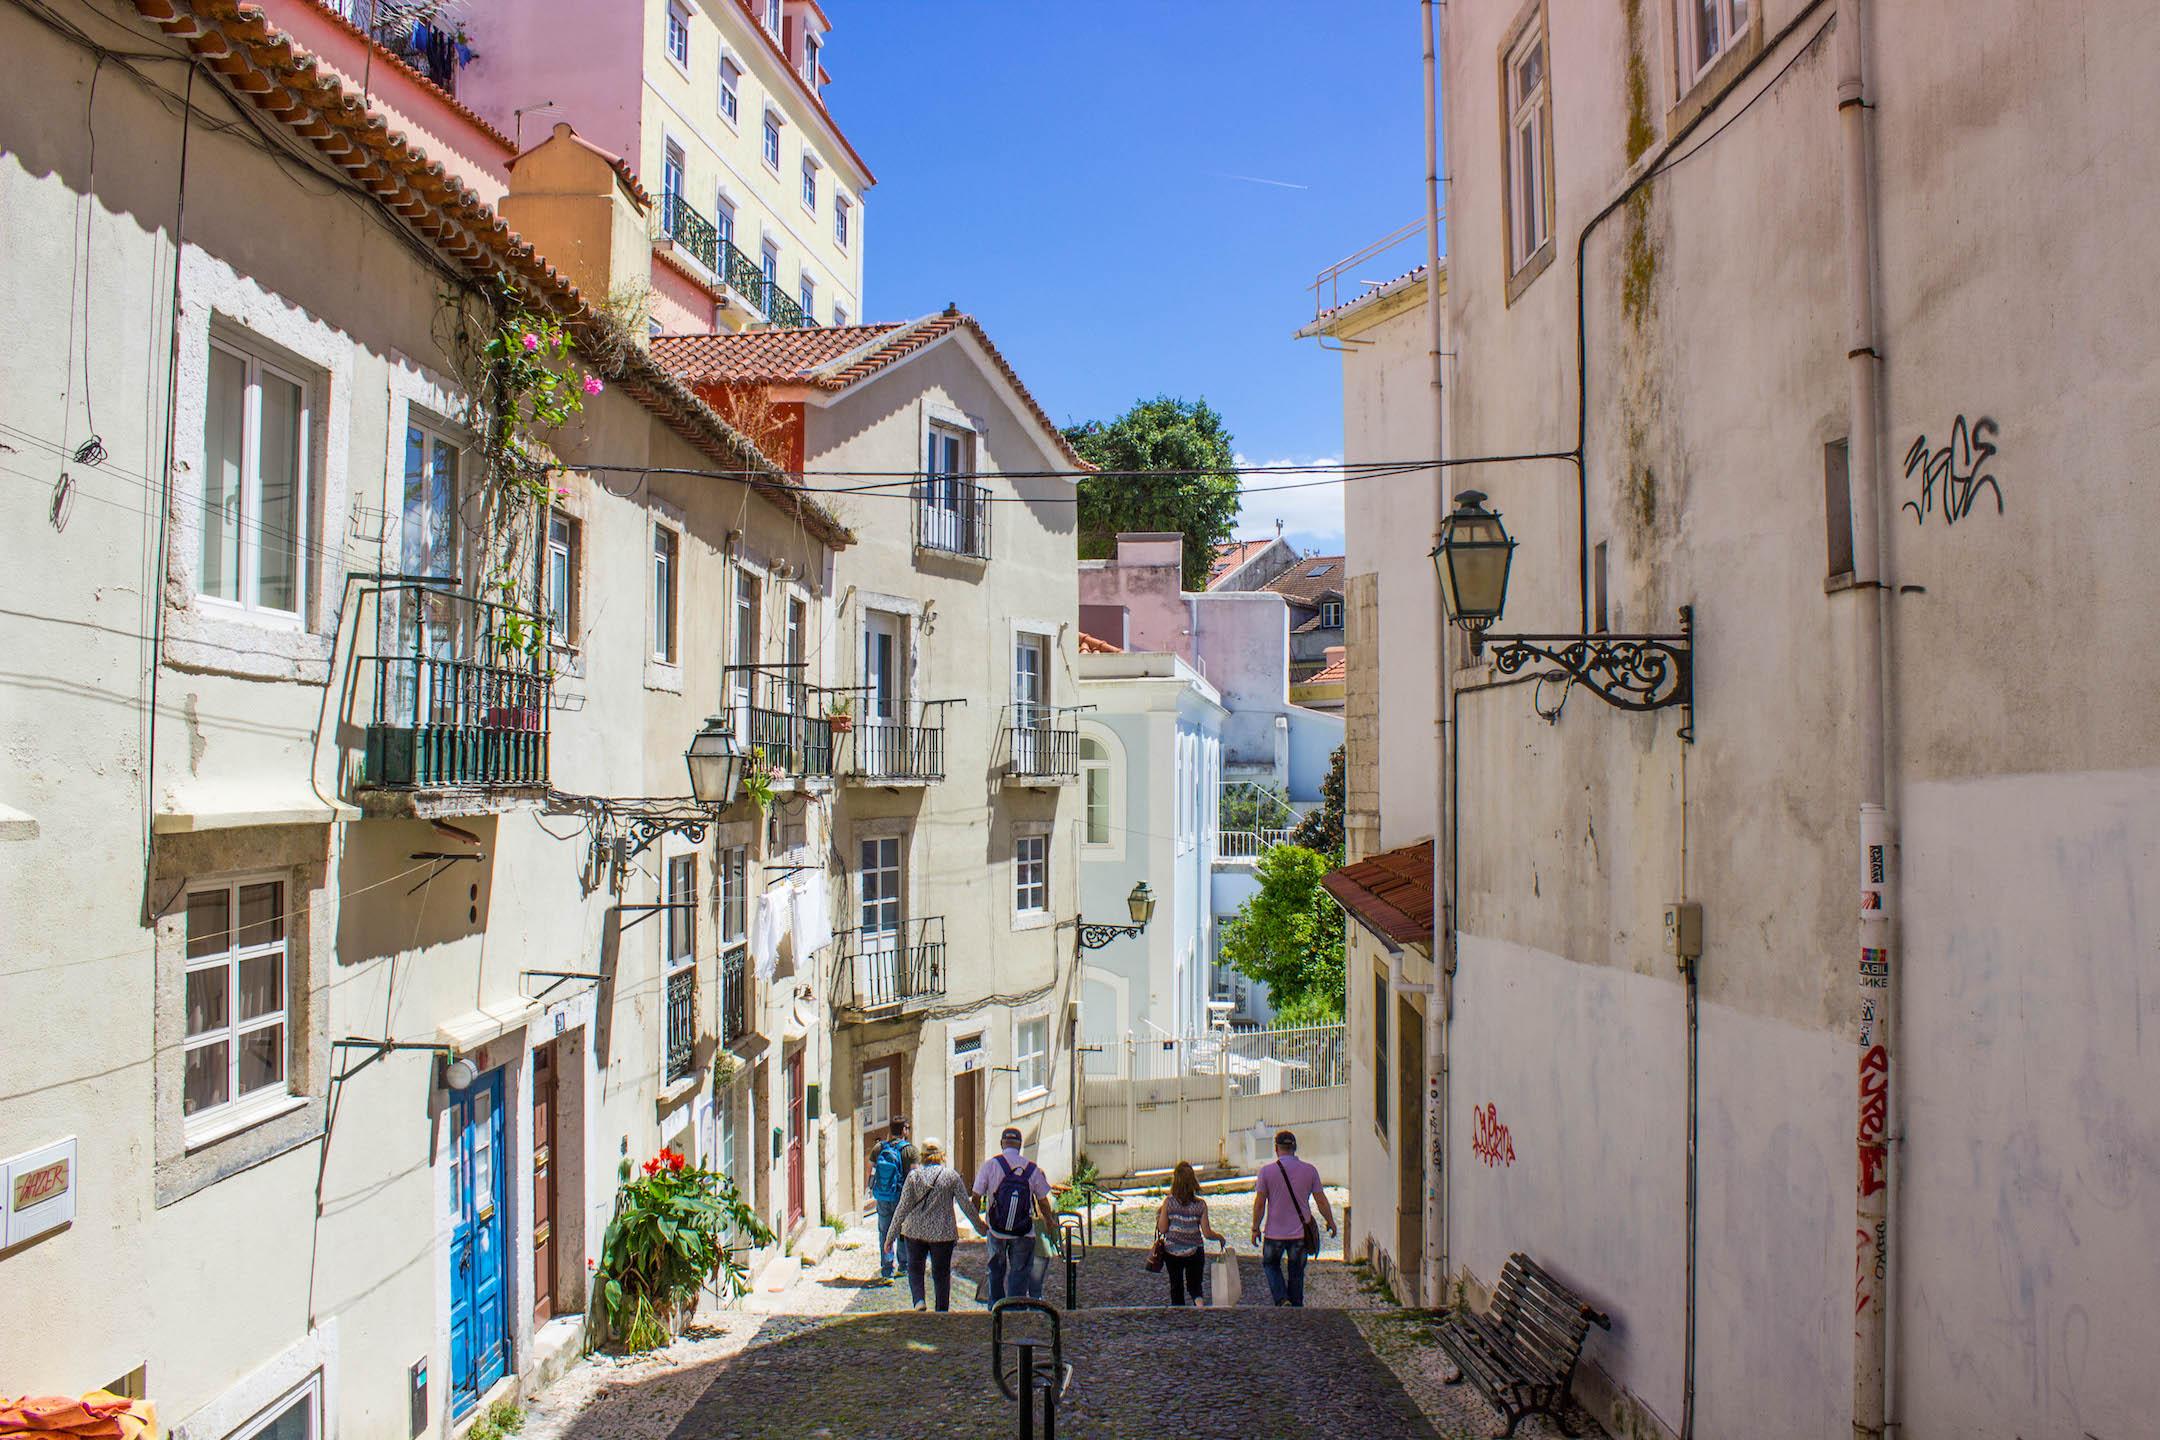 Streets of medieval Lisbon